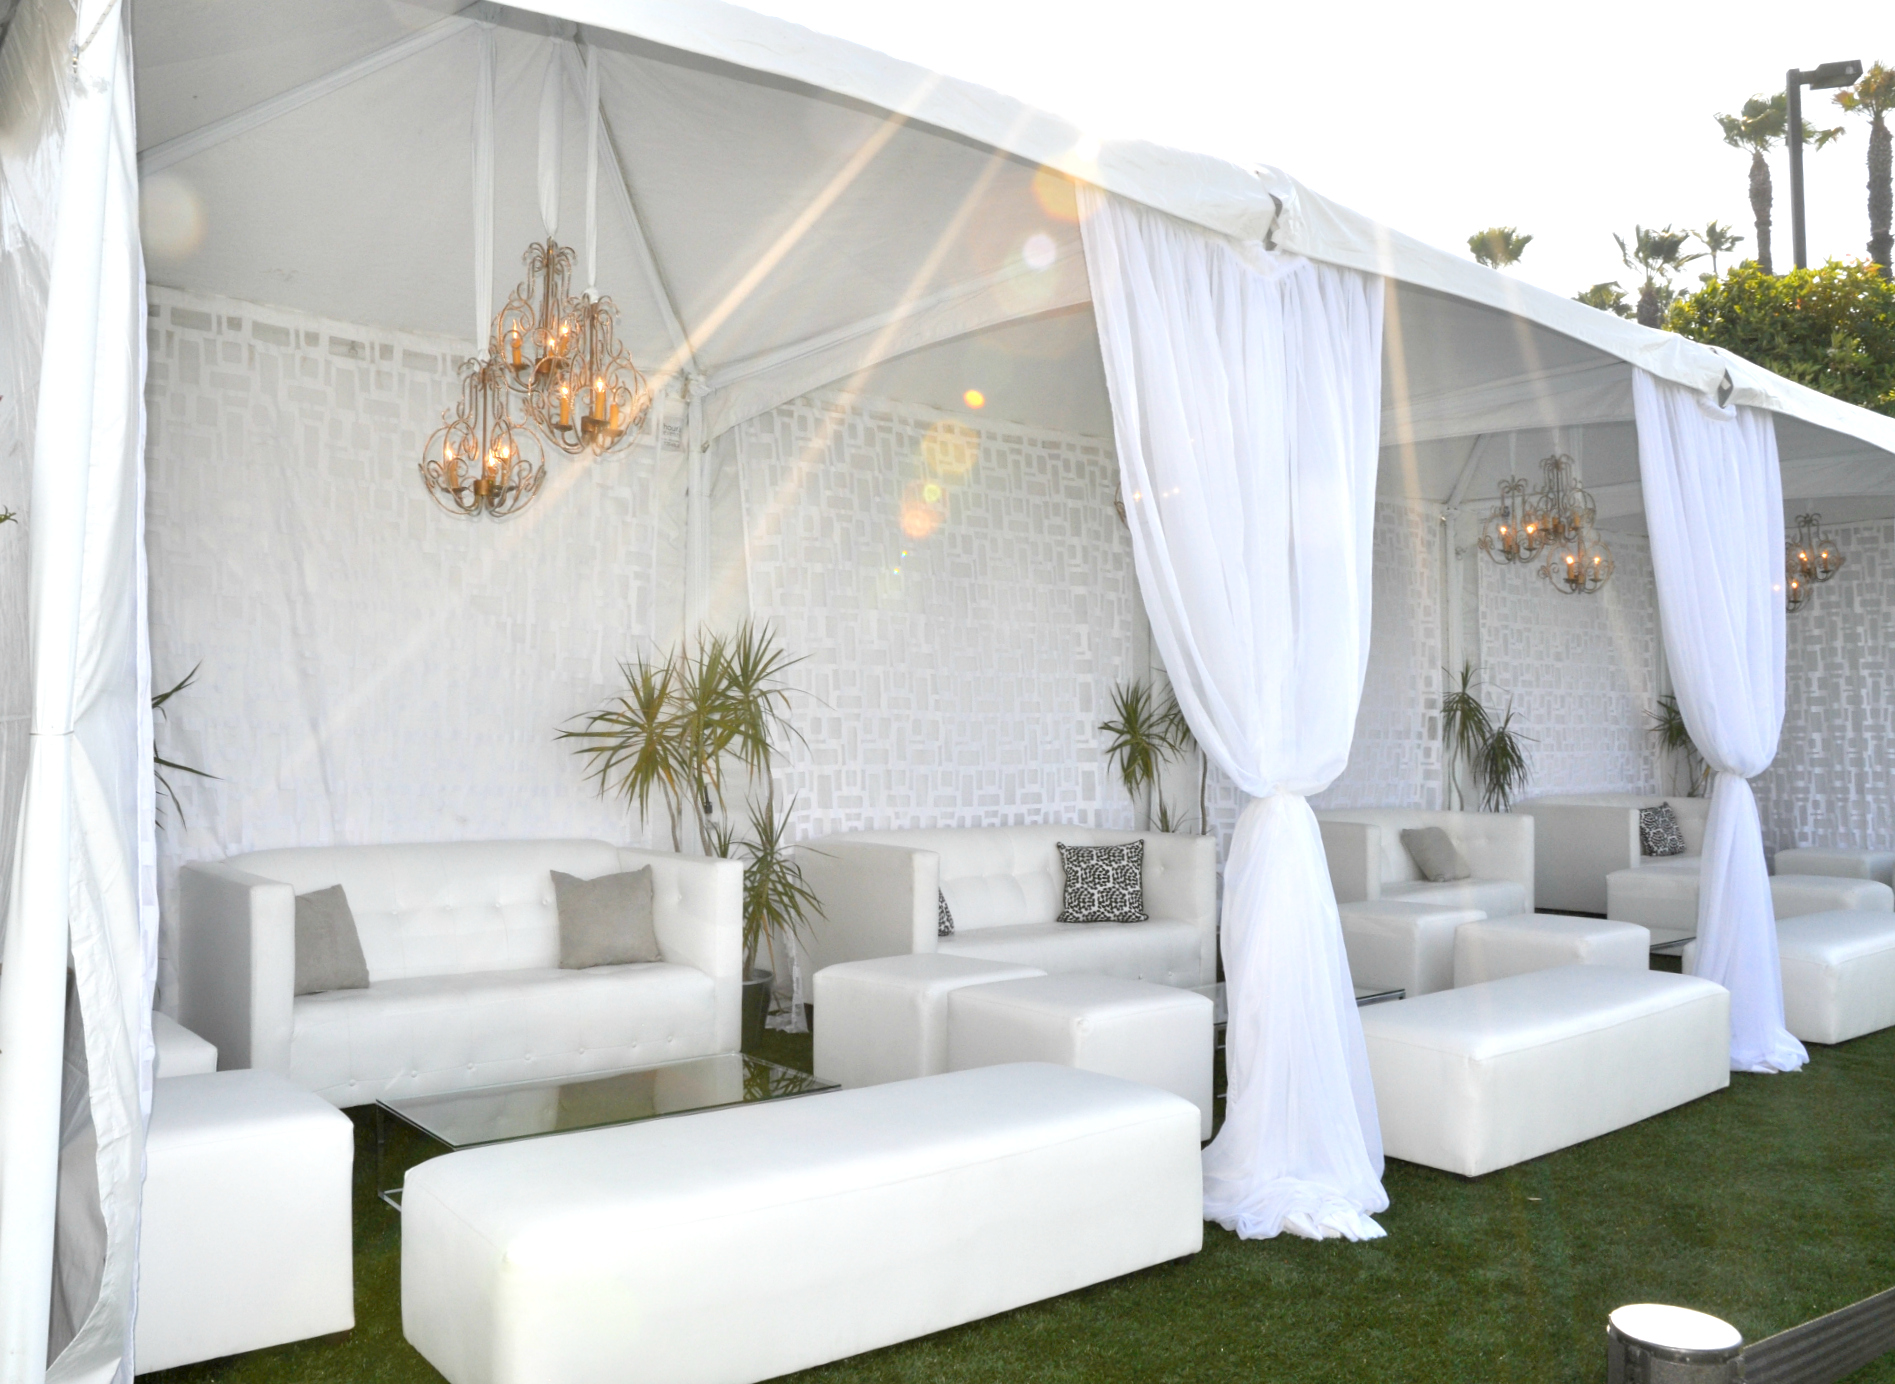 ChouraEvents_All_White_Lounge.jpg